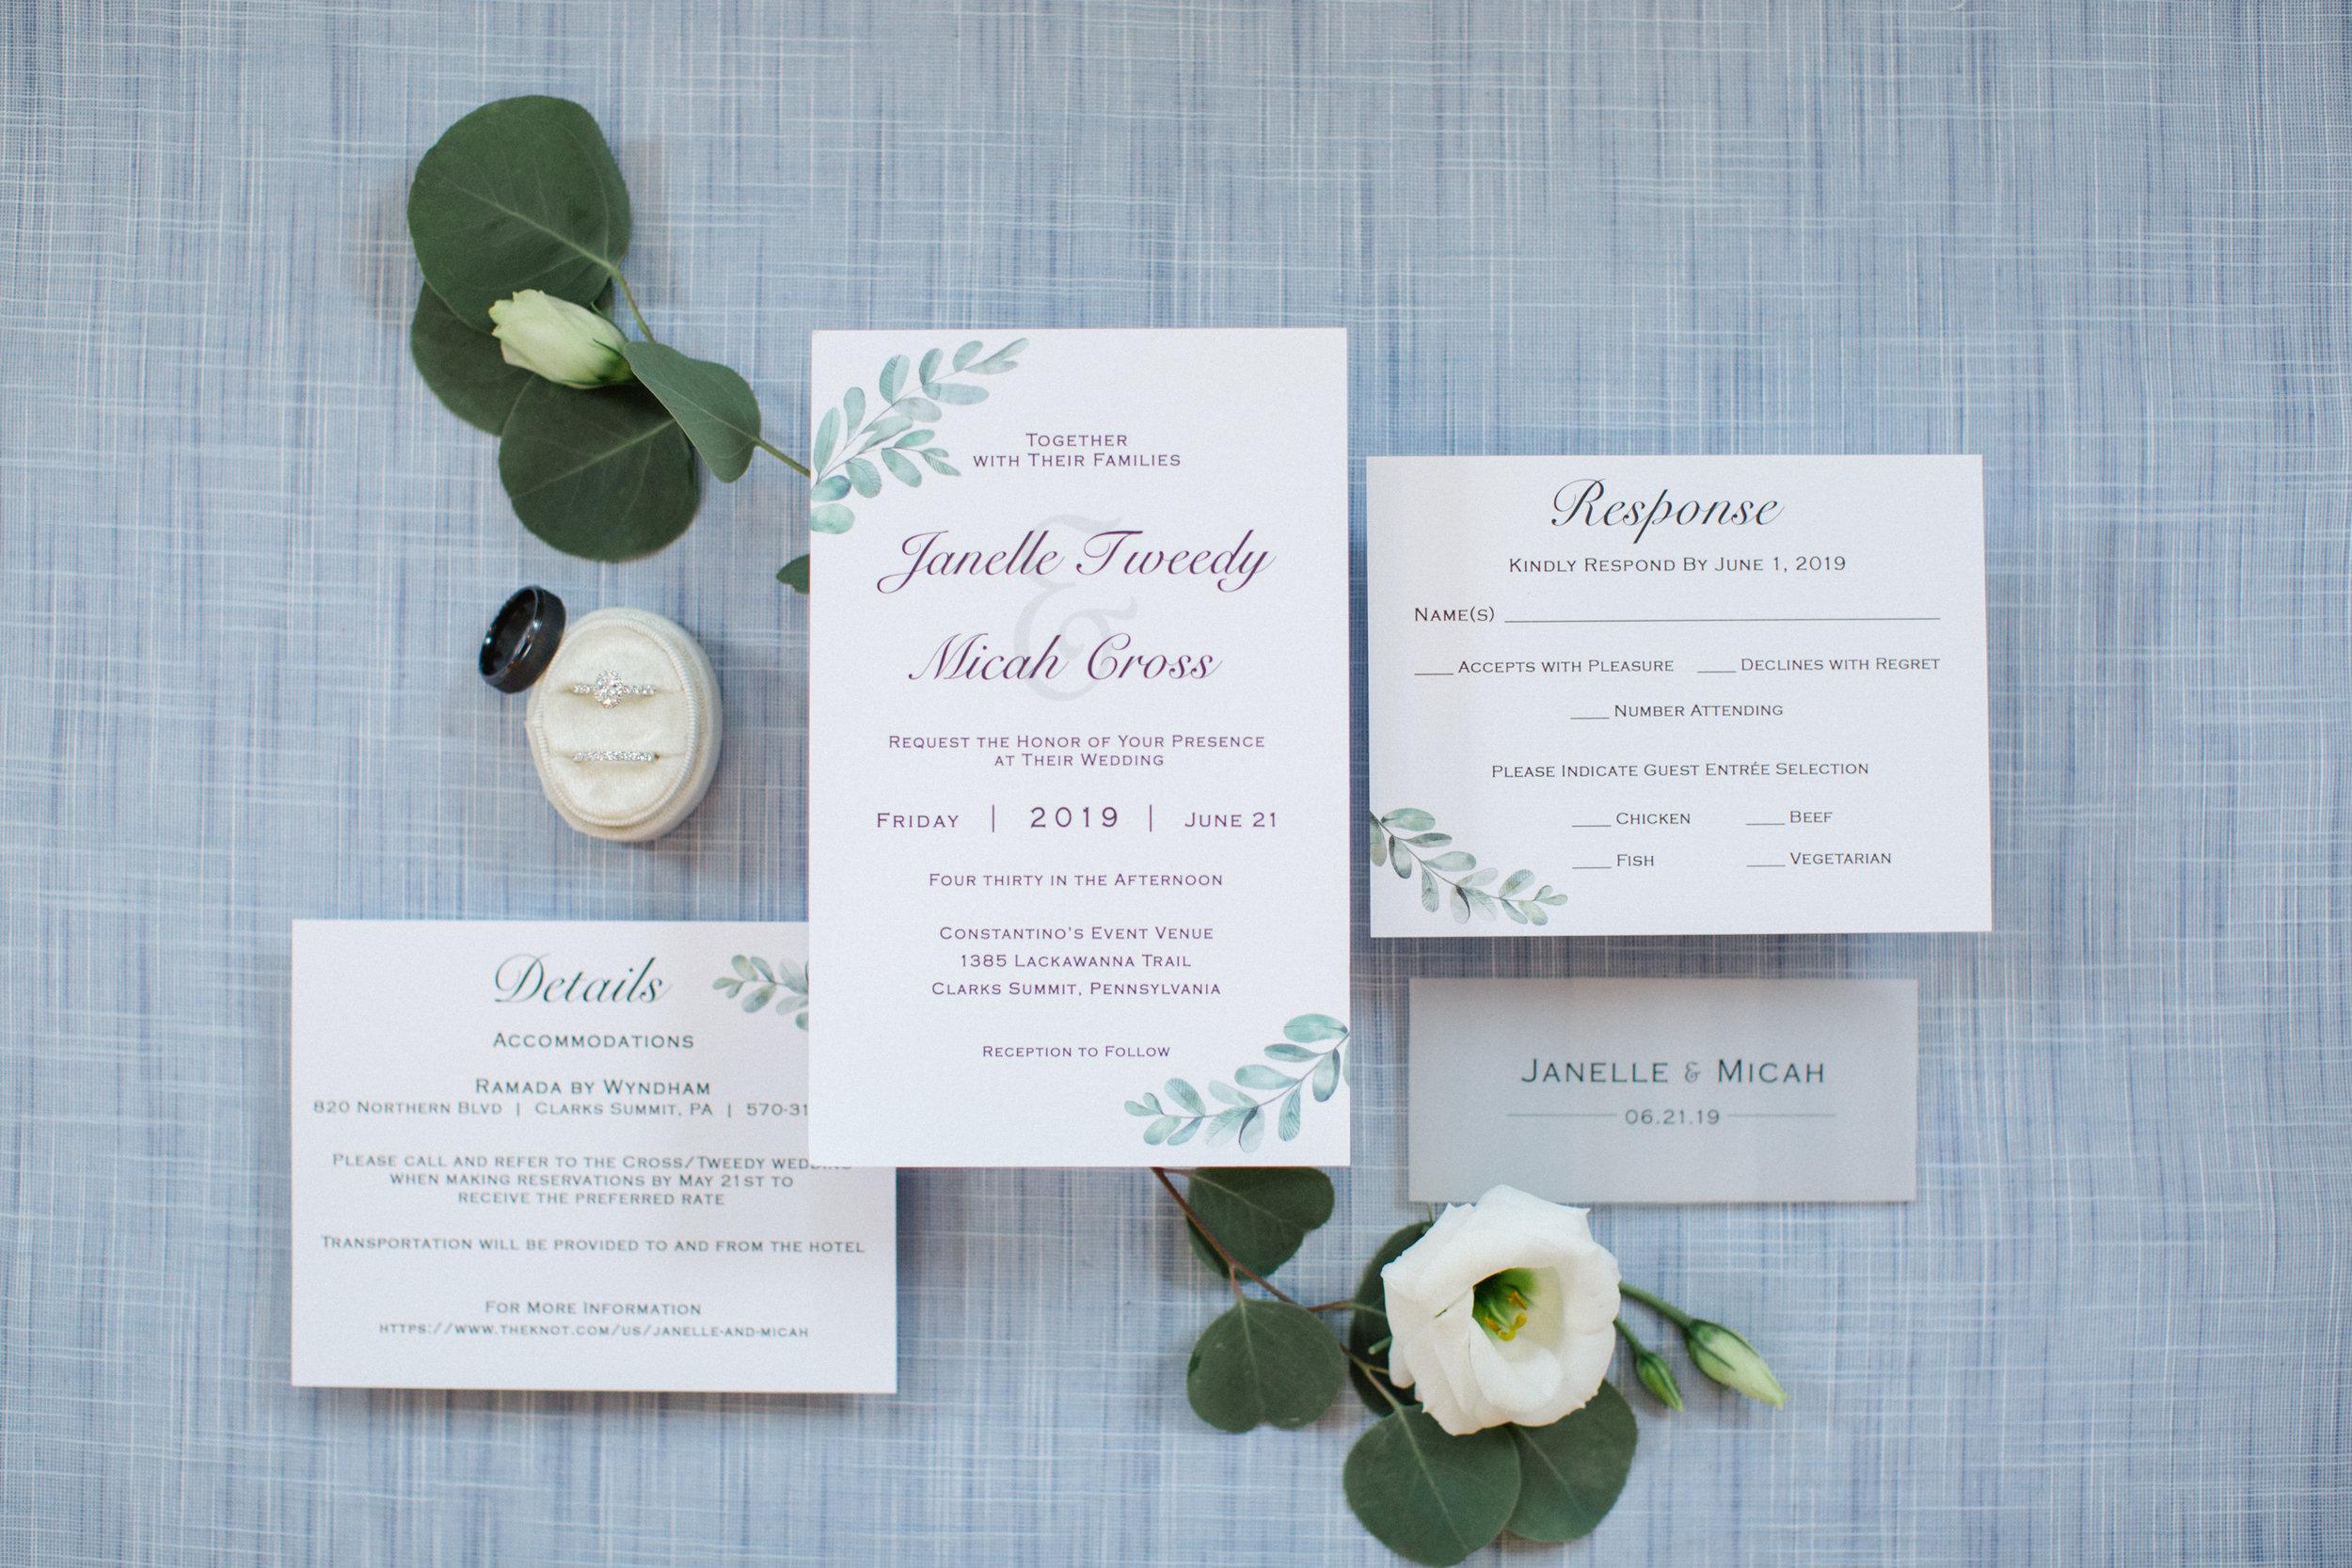 Constantino's Catering Event Venue Wedding Photos-1.jpg